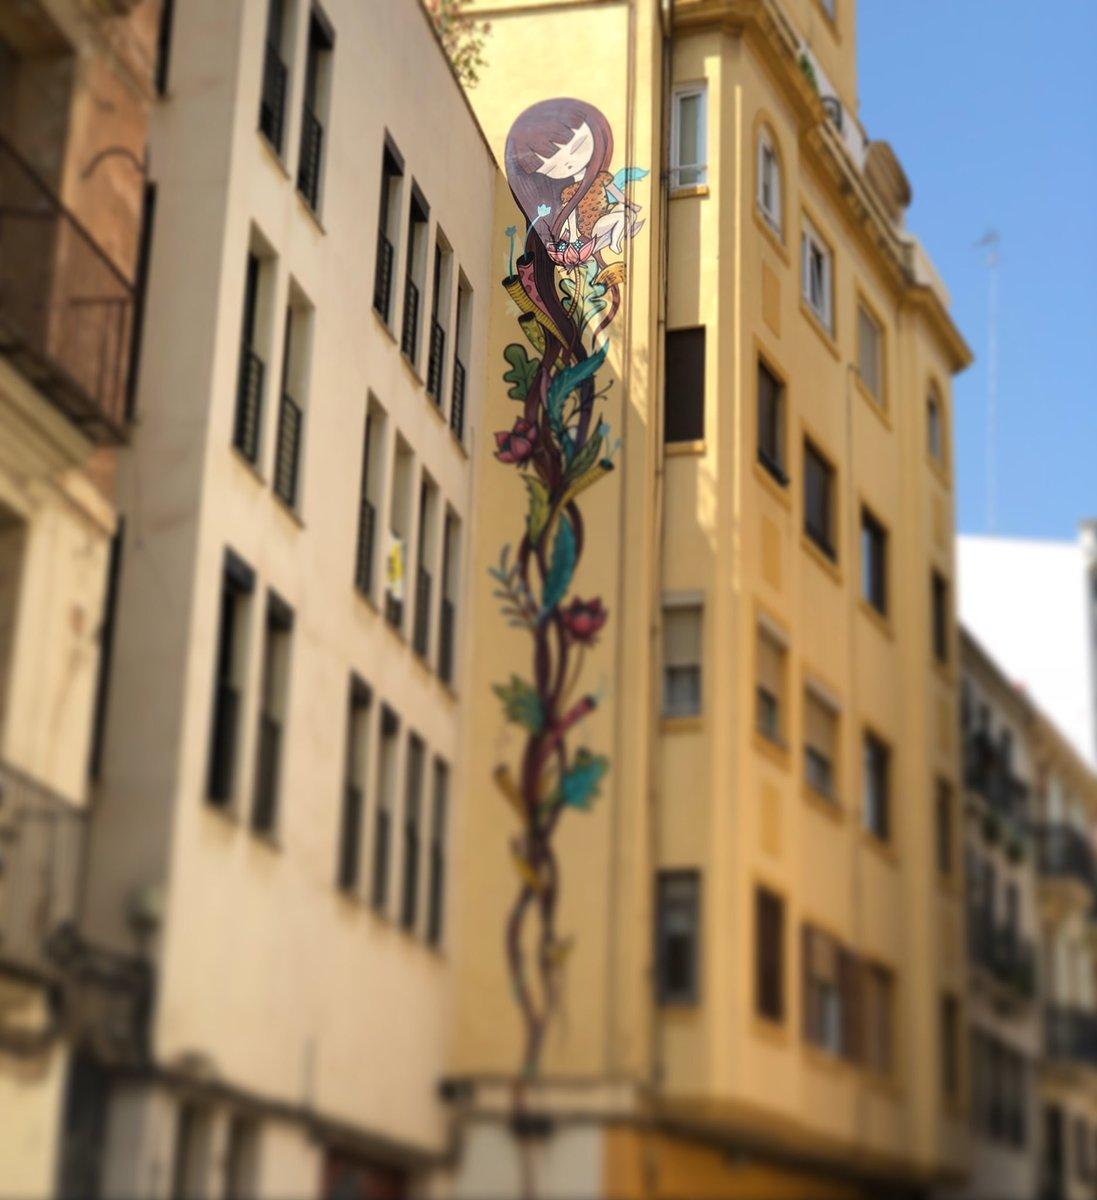 #Arte de ese que hace que envidie paredes... #art #urbanart #BEN